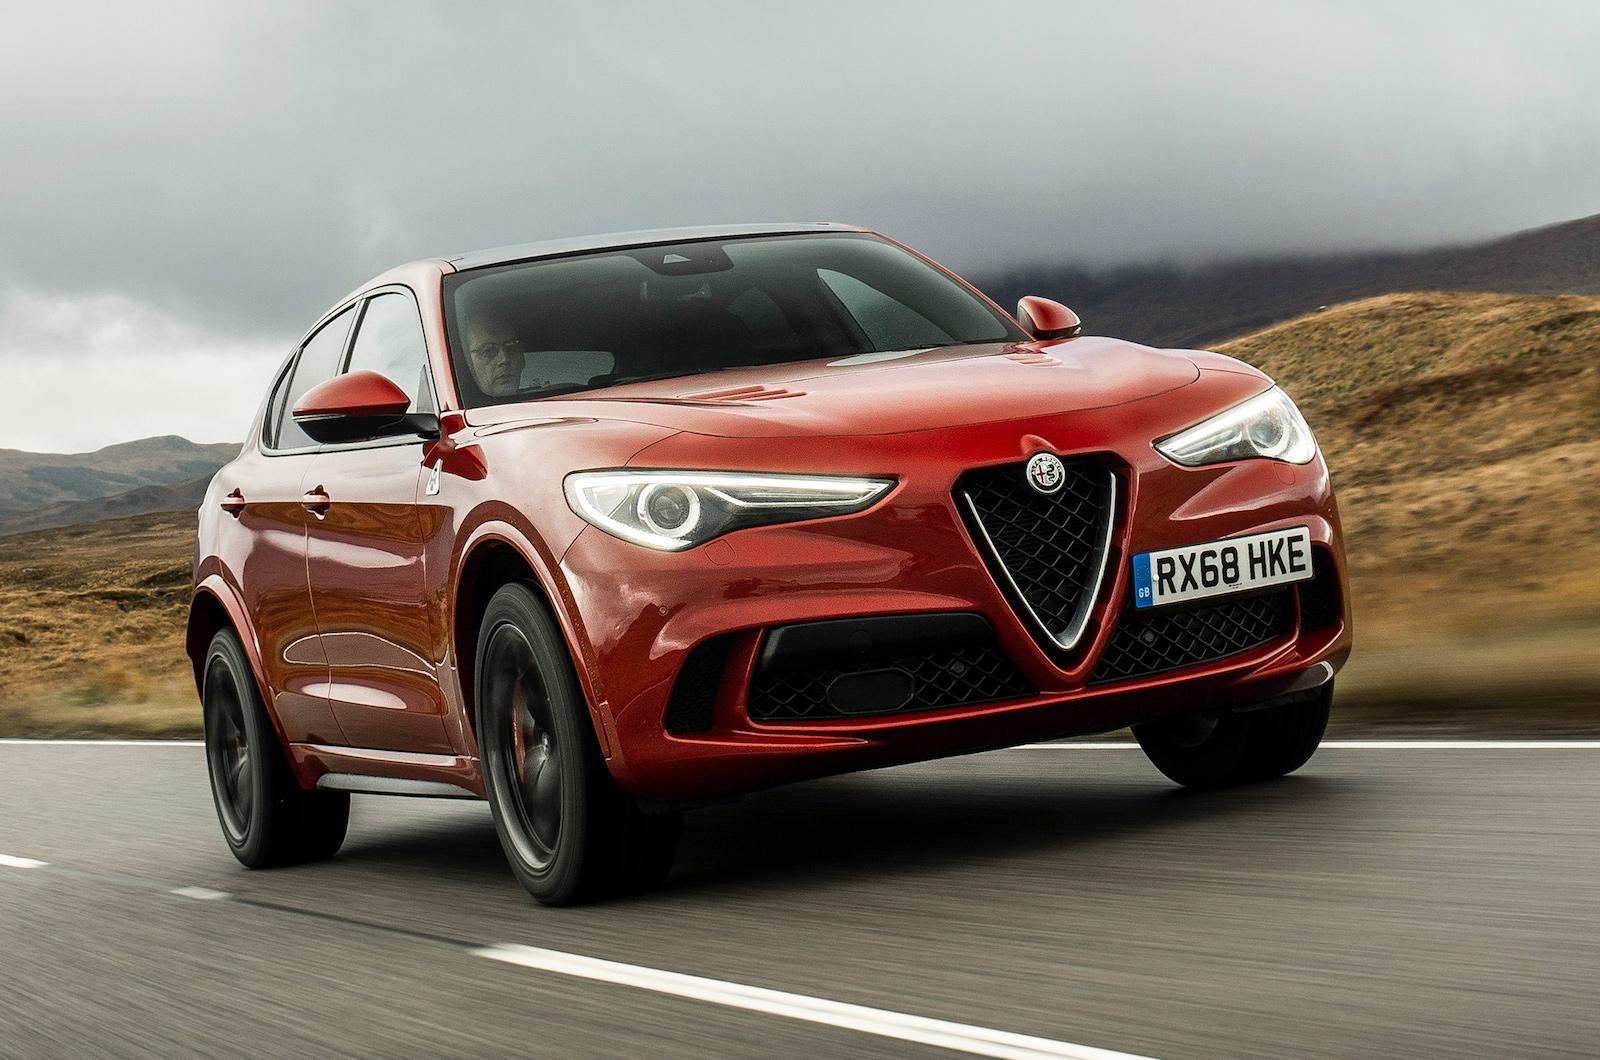 2019 Alfa Romeo Stelvio Quadrifoglio Review Price Specs And Rear End Quad Scotland